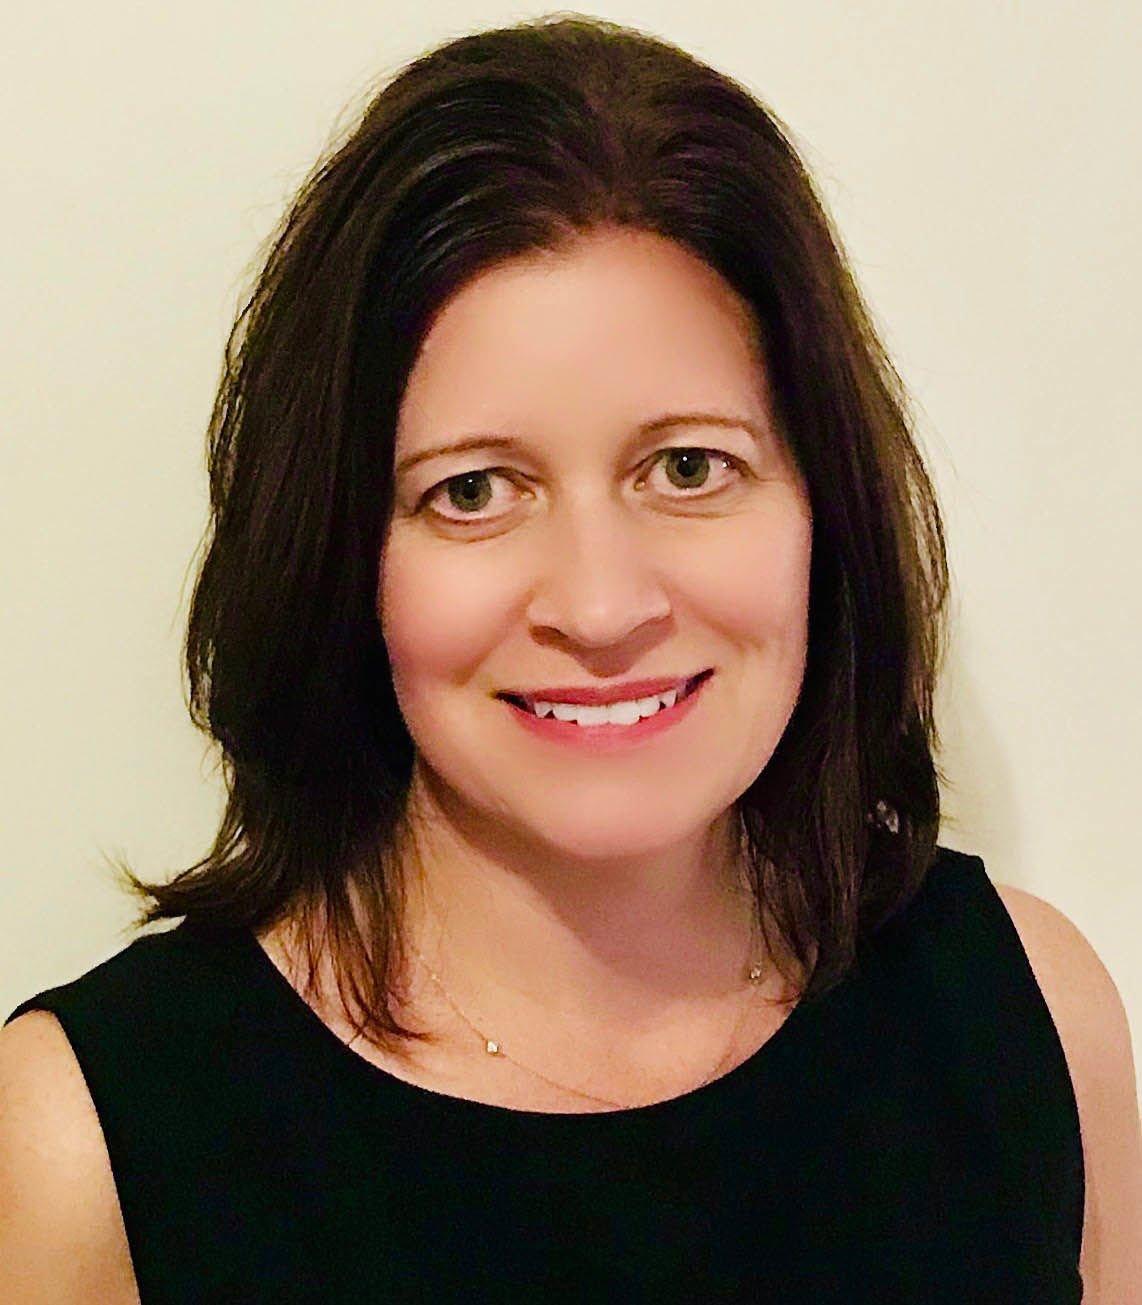 Christine Ritchie - Minnetonka School Board Candidate